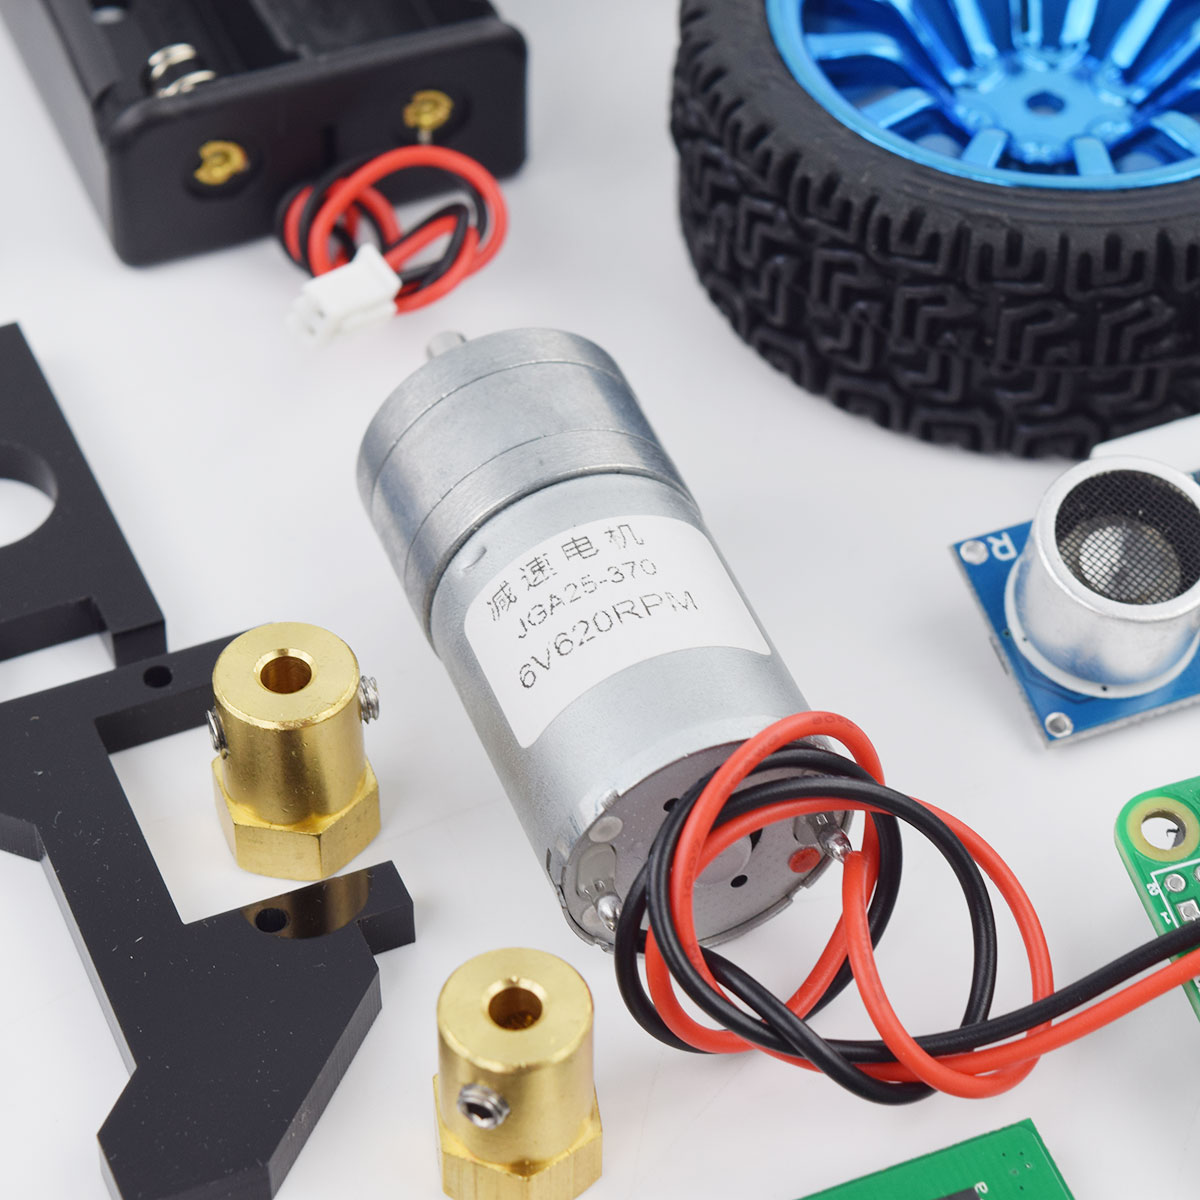 mars rover robot kit - photo #23